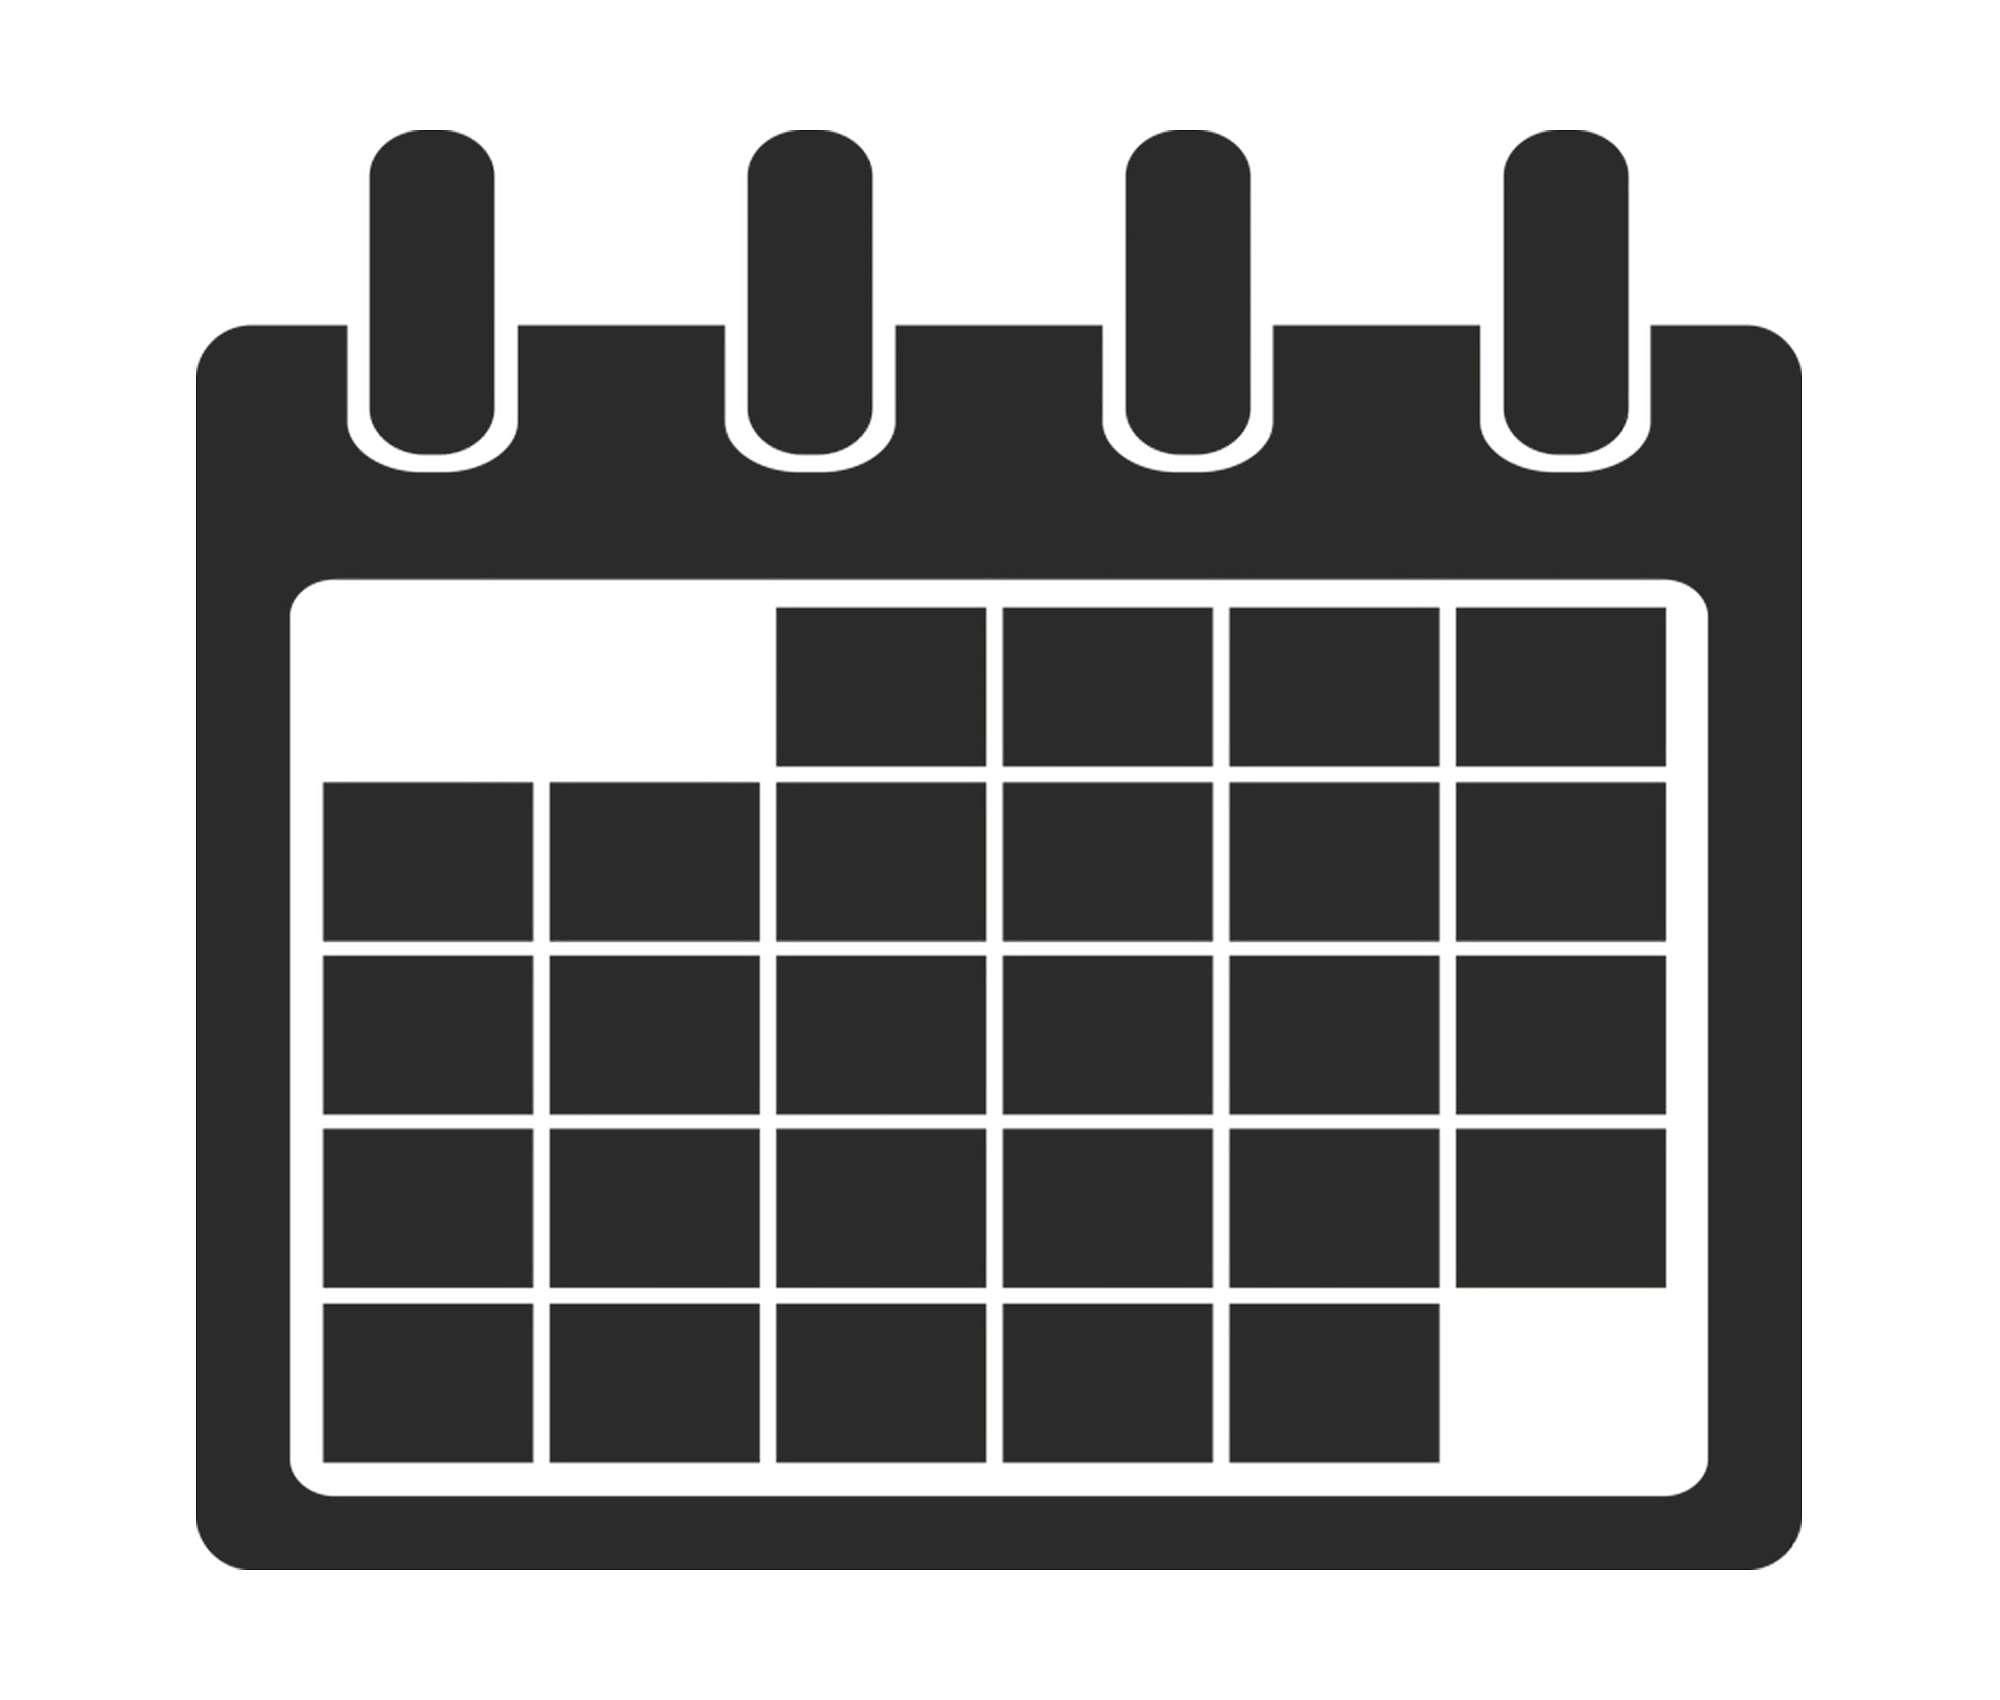 School Calendar 2019 - Term 3 - Homepage